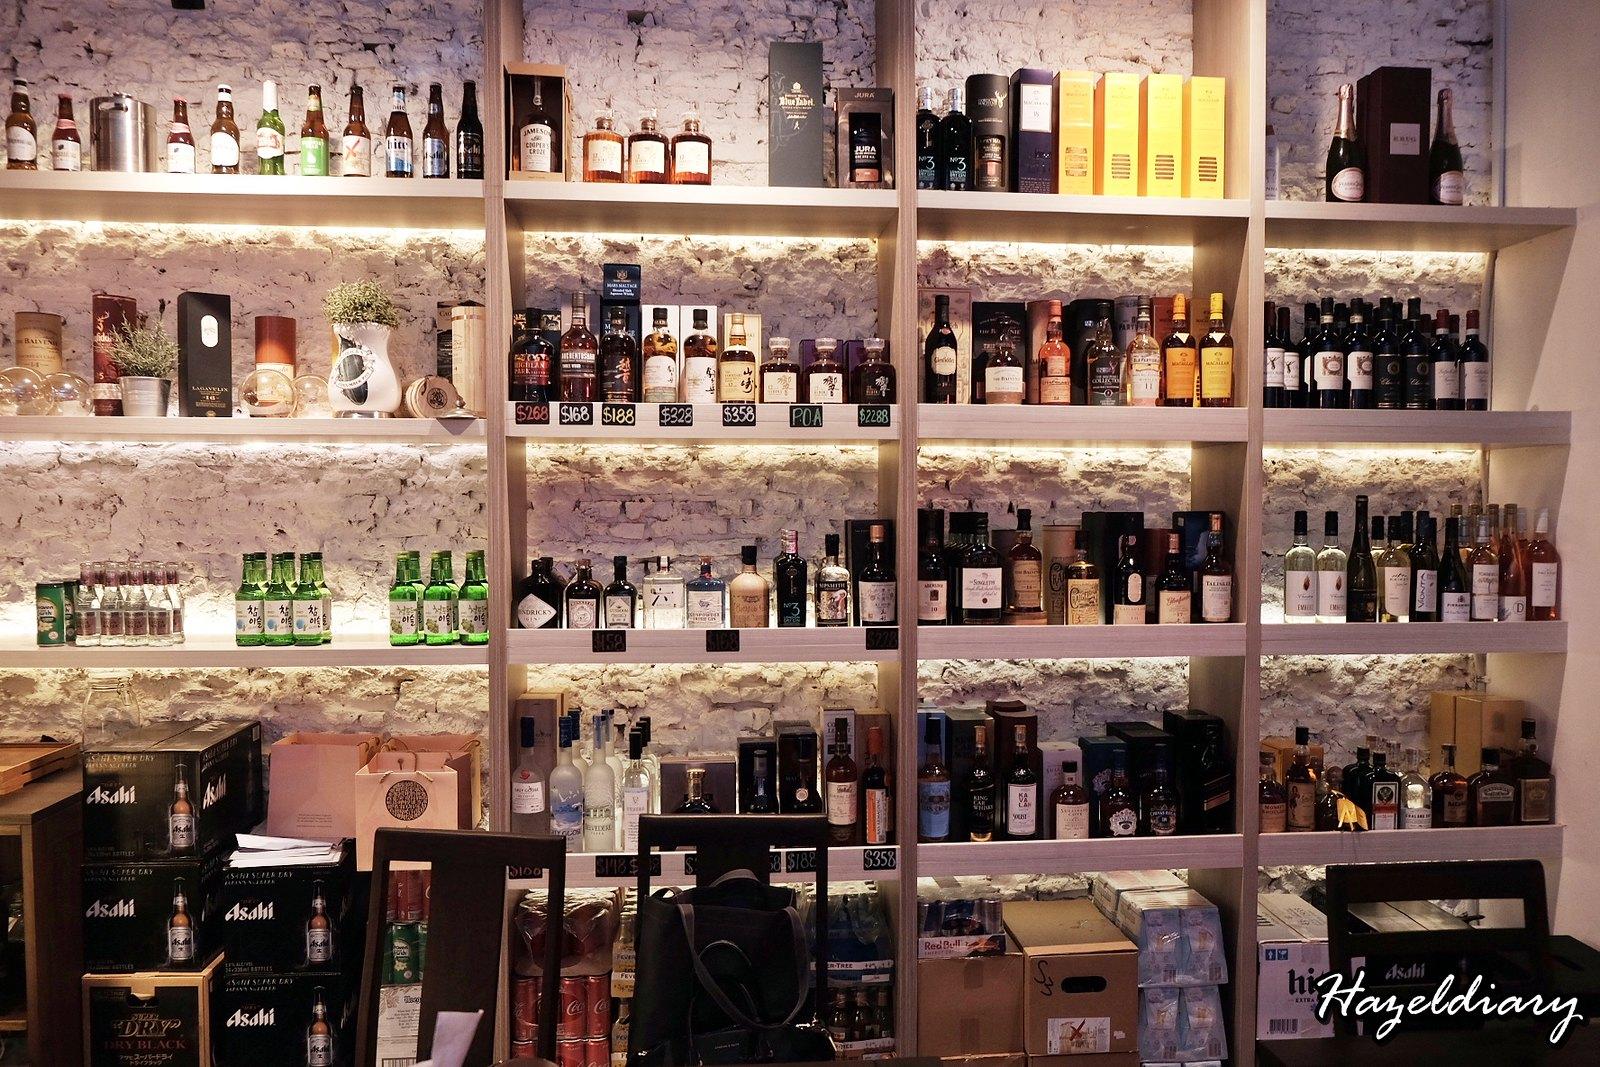 House of MU-Hazeldiary-Alcohol Selection